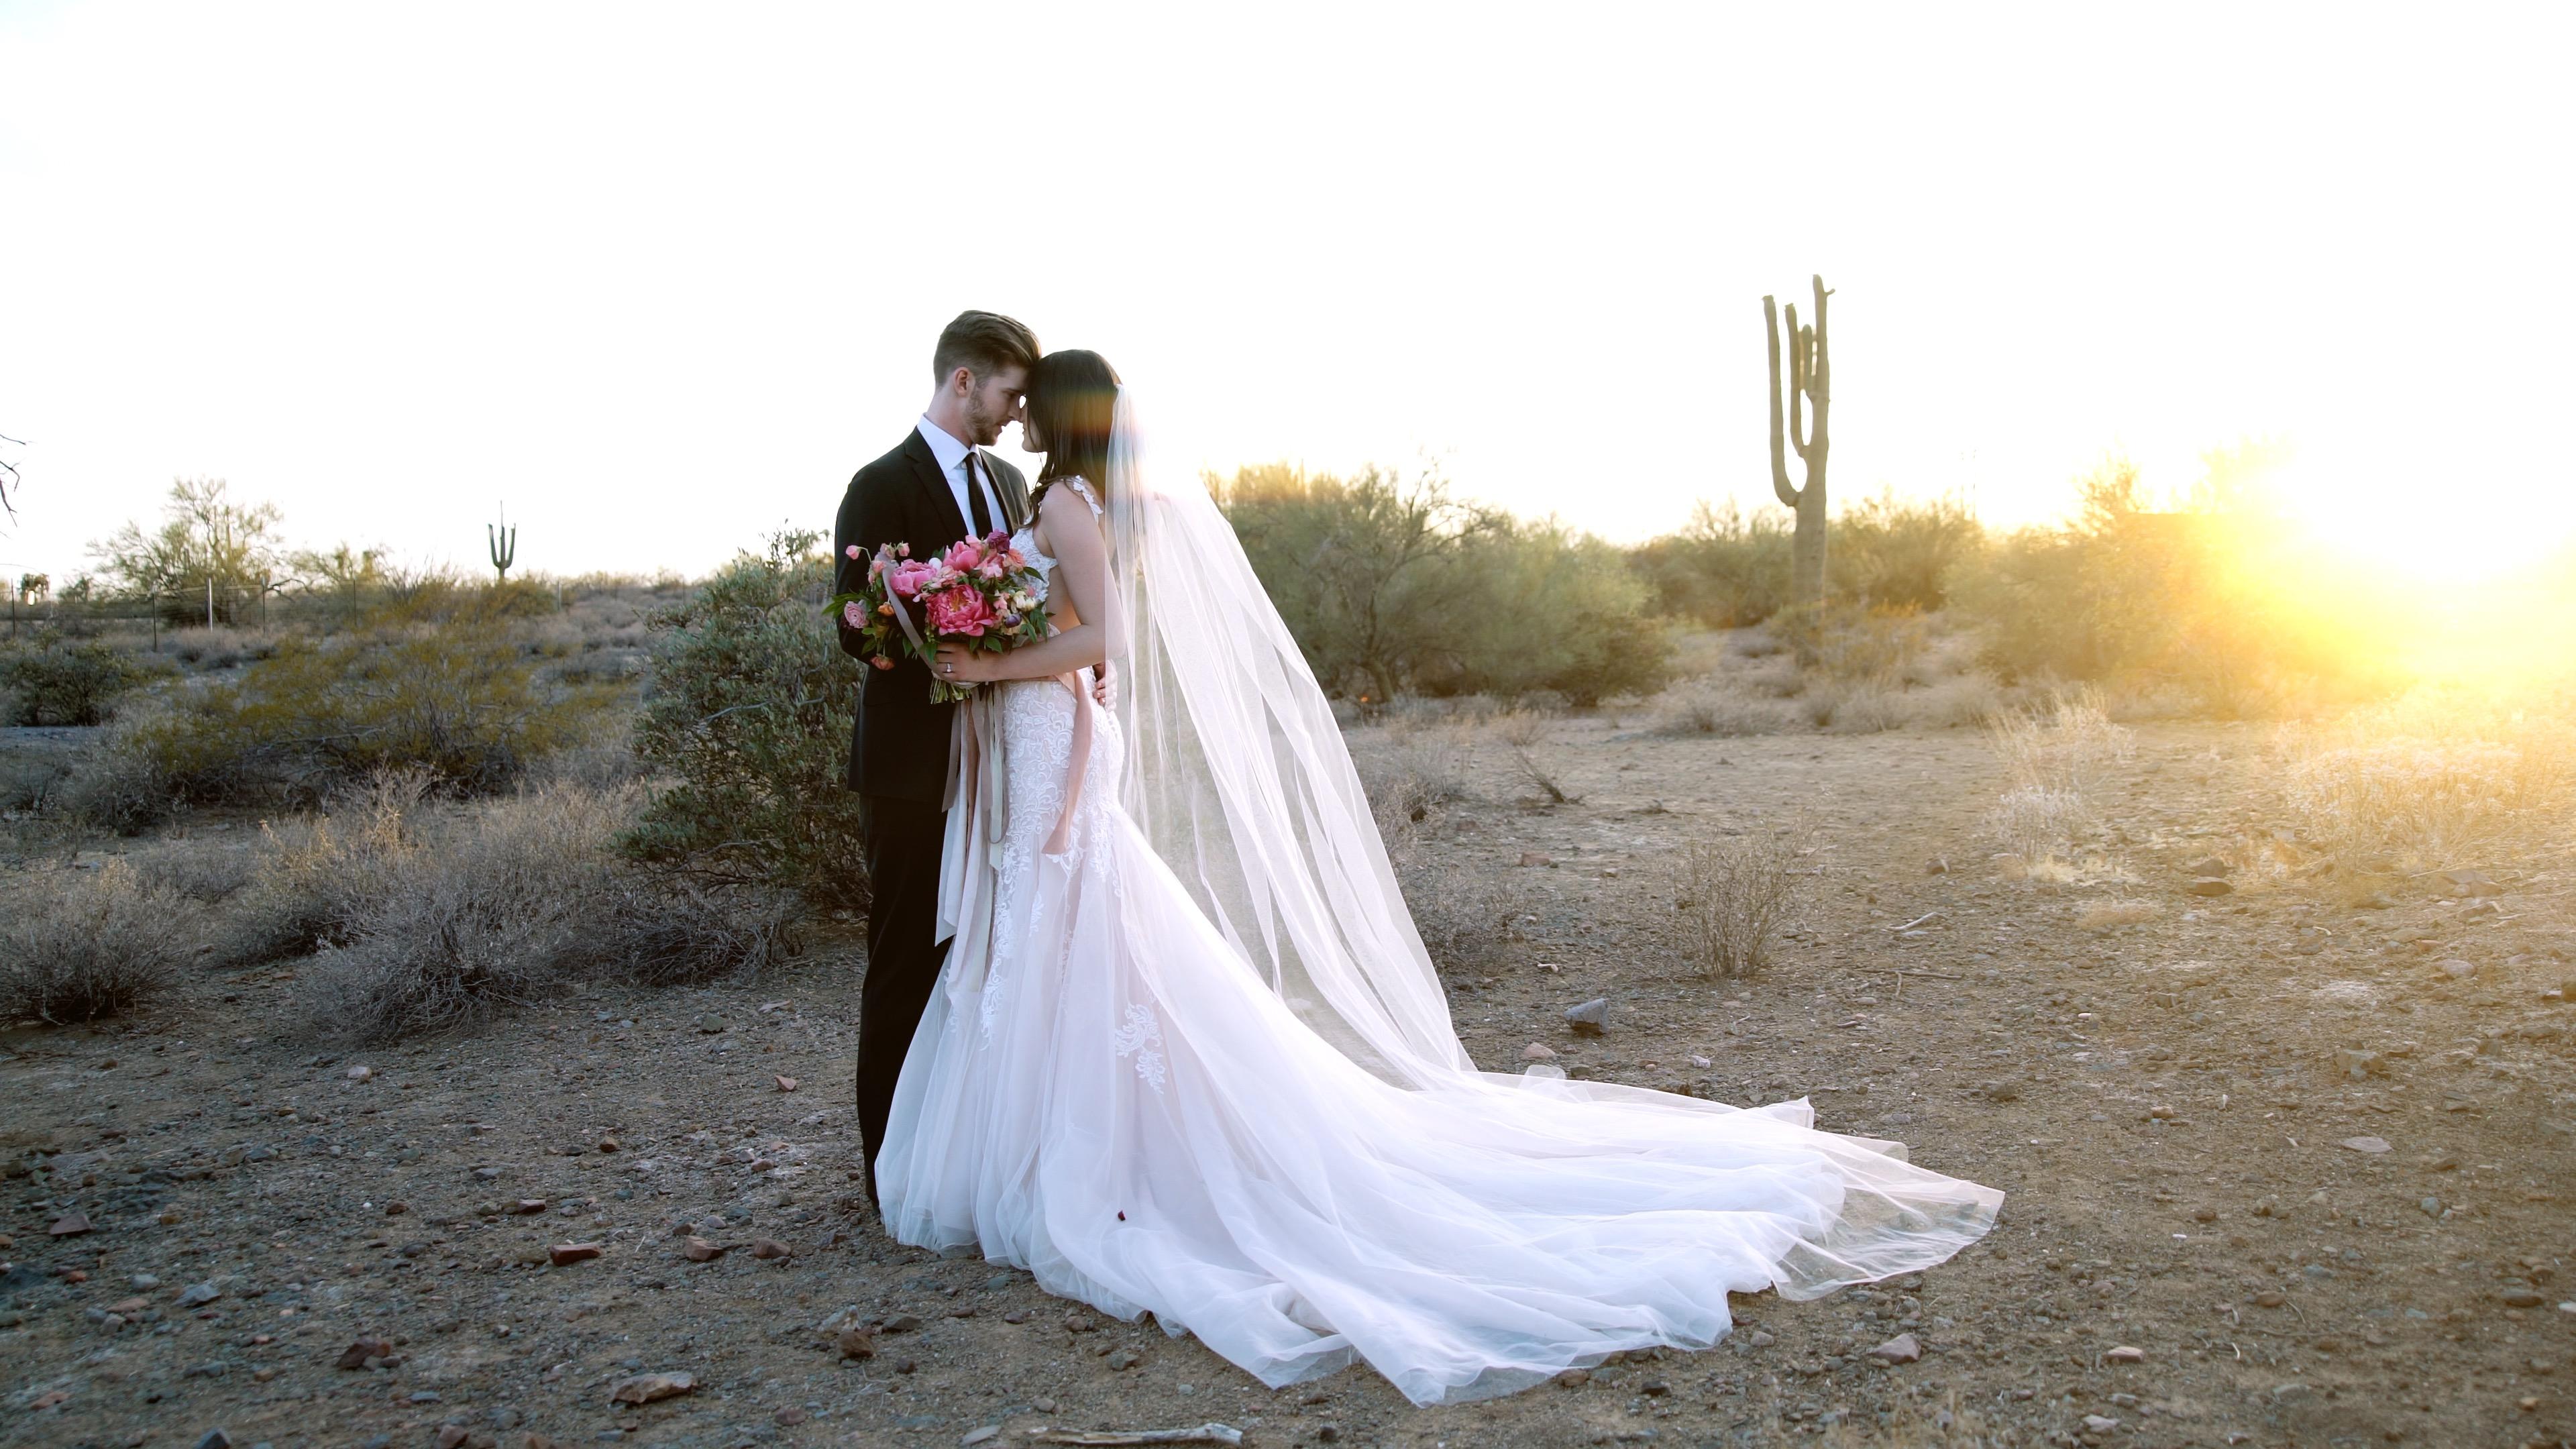 Gabriella + TJ | Phoenix, Arizona | The Paseo